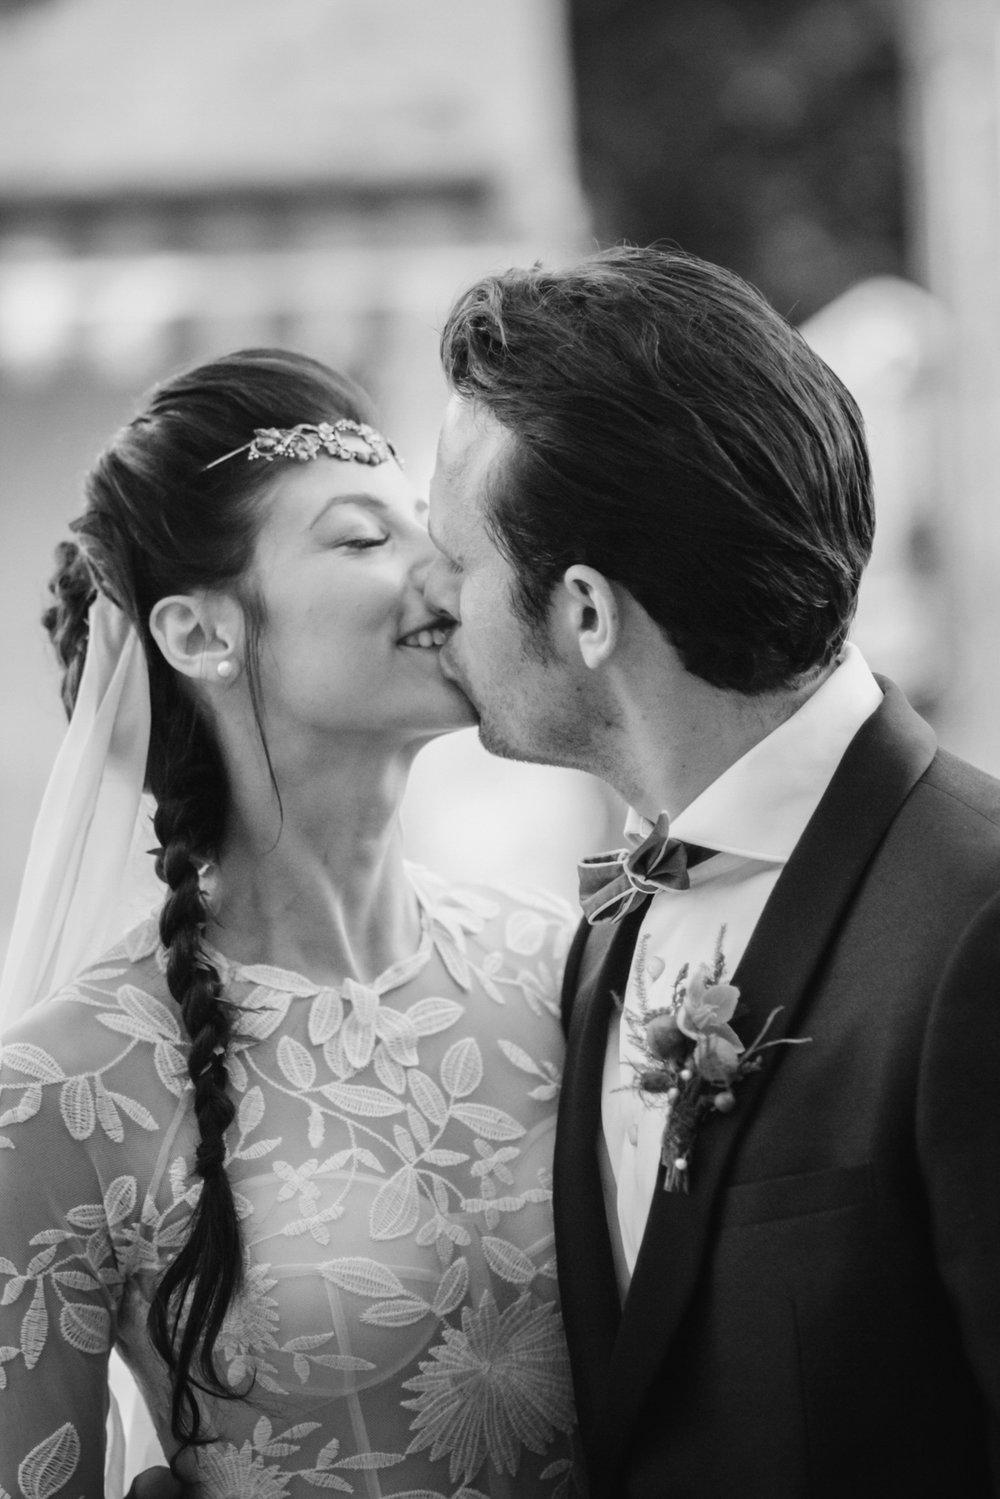 Kimberly-Coccagnia-Wedding-Photographer-166.JPG